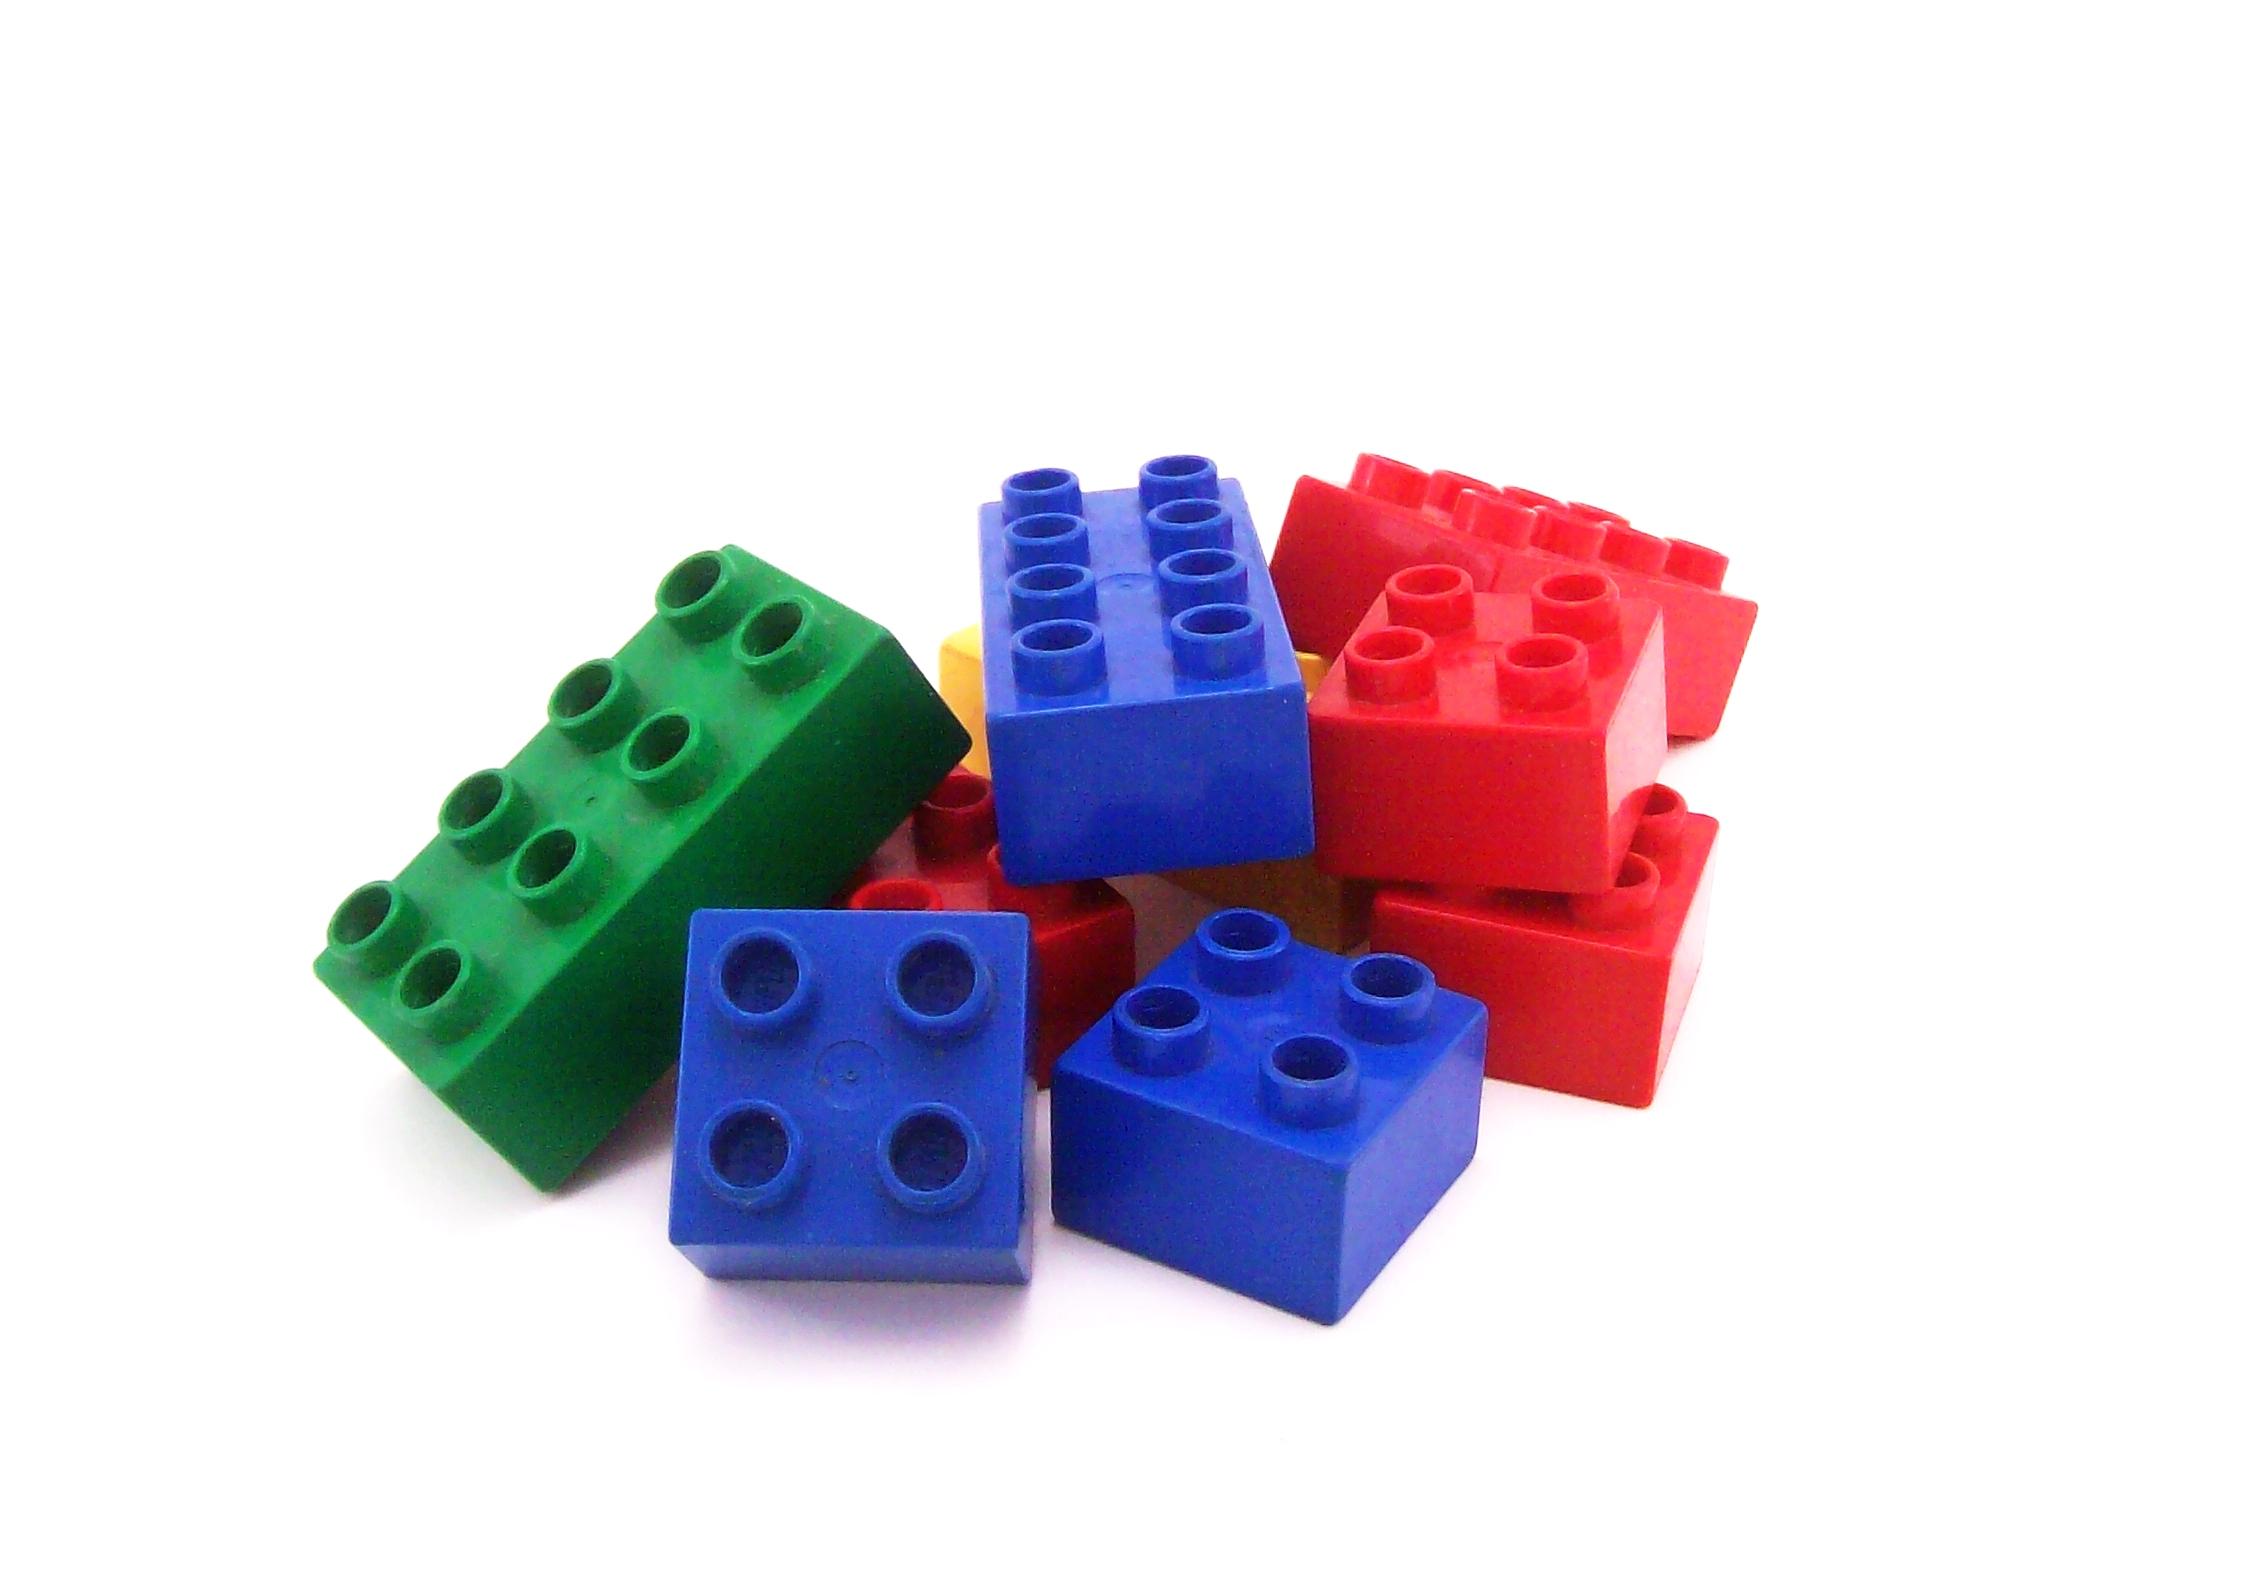 Lego bricks, Blue, Bricks, Colorful, Green, HQ Photo